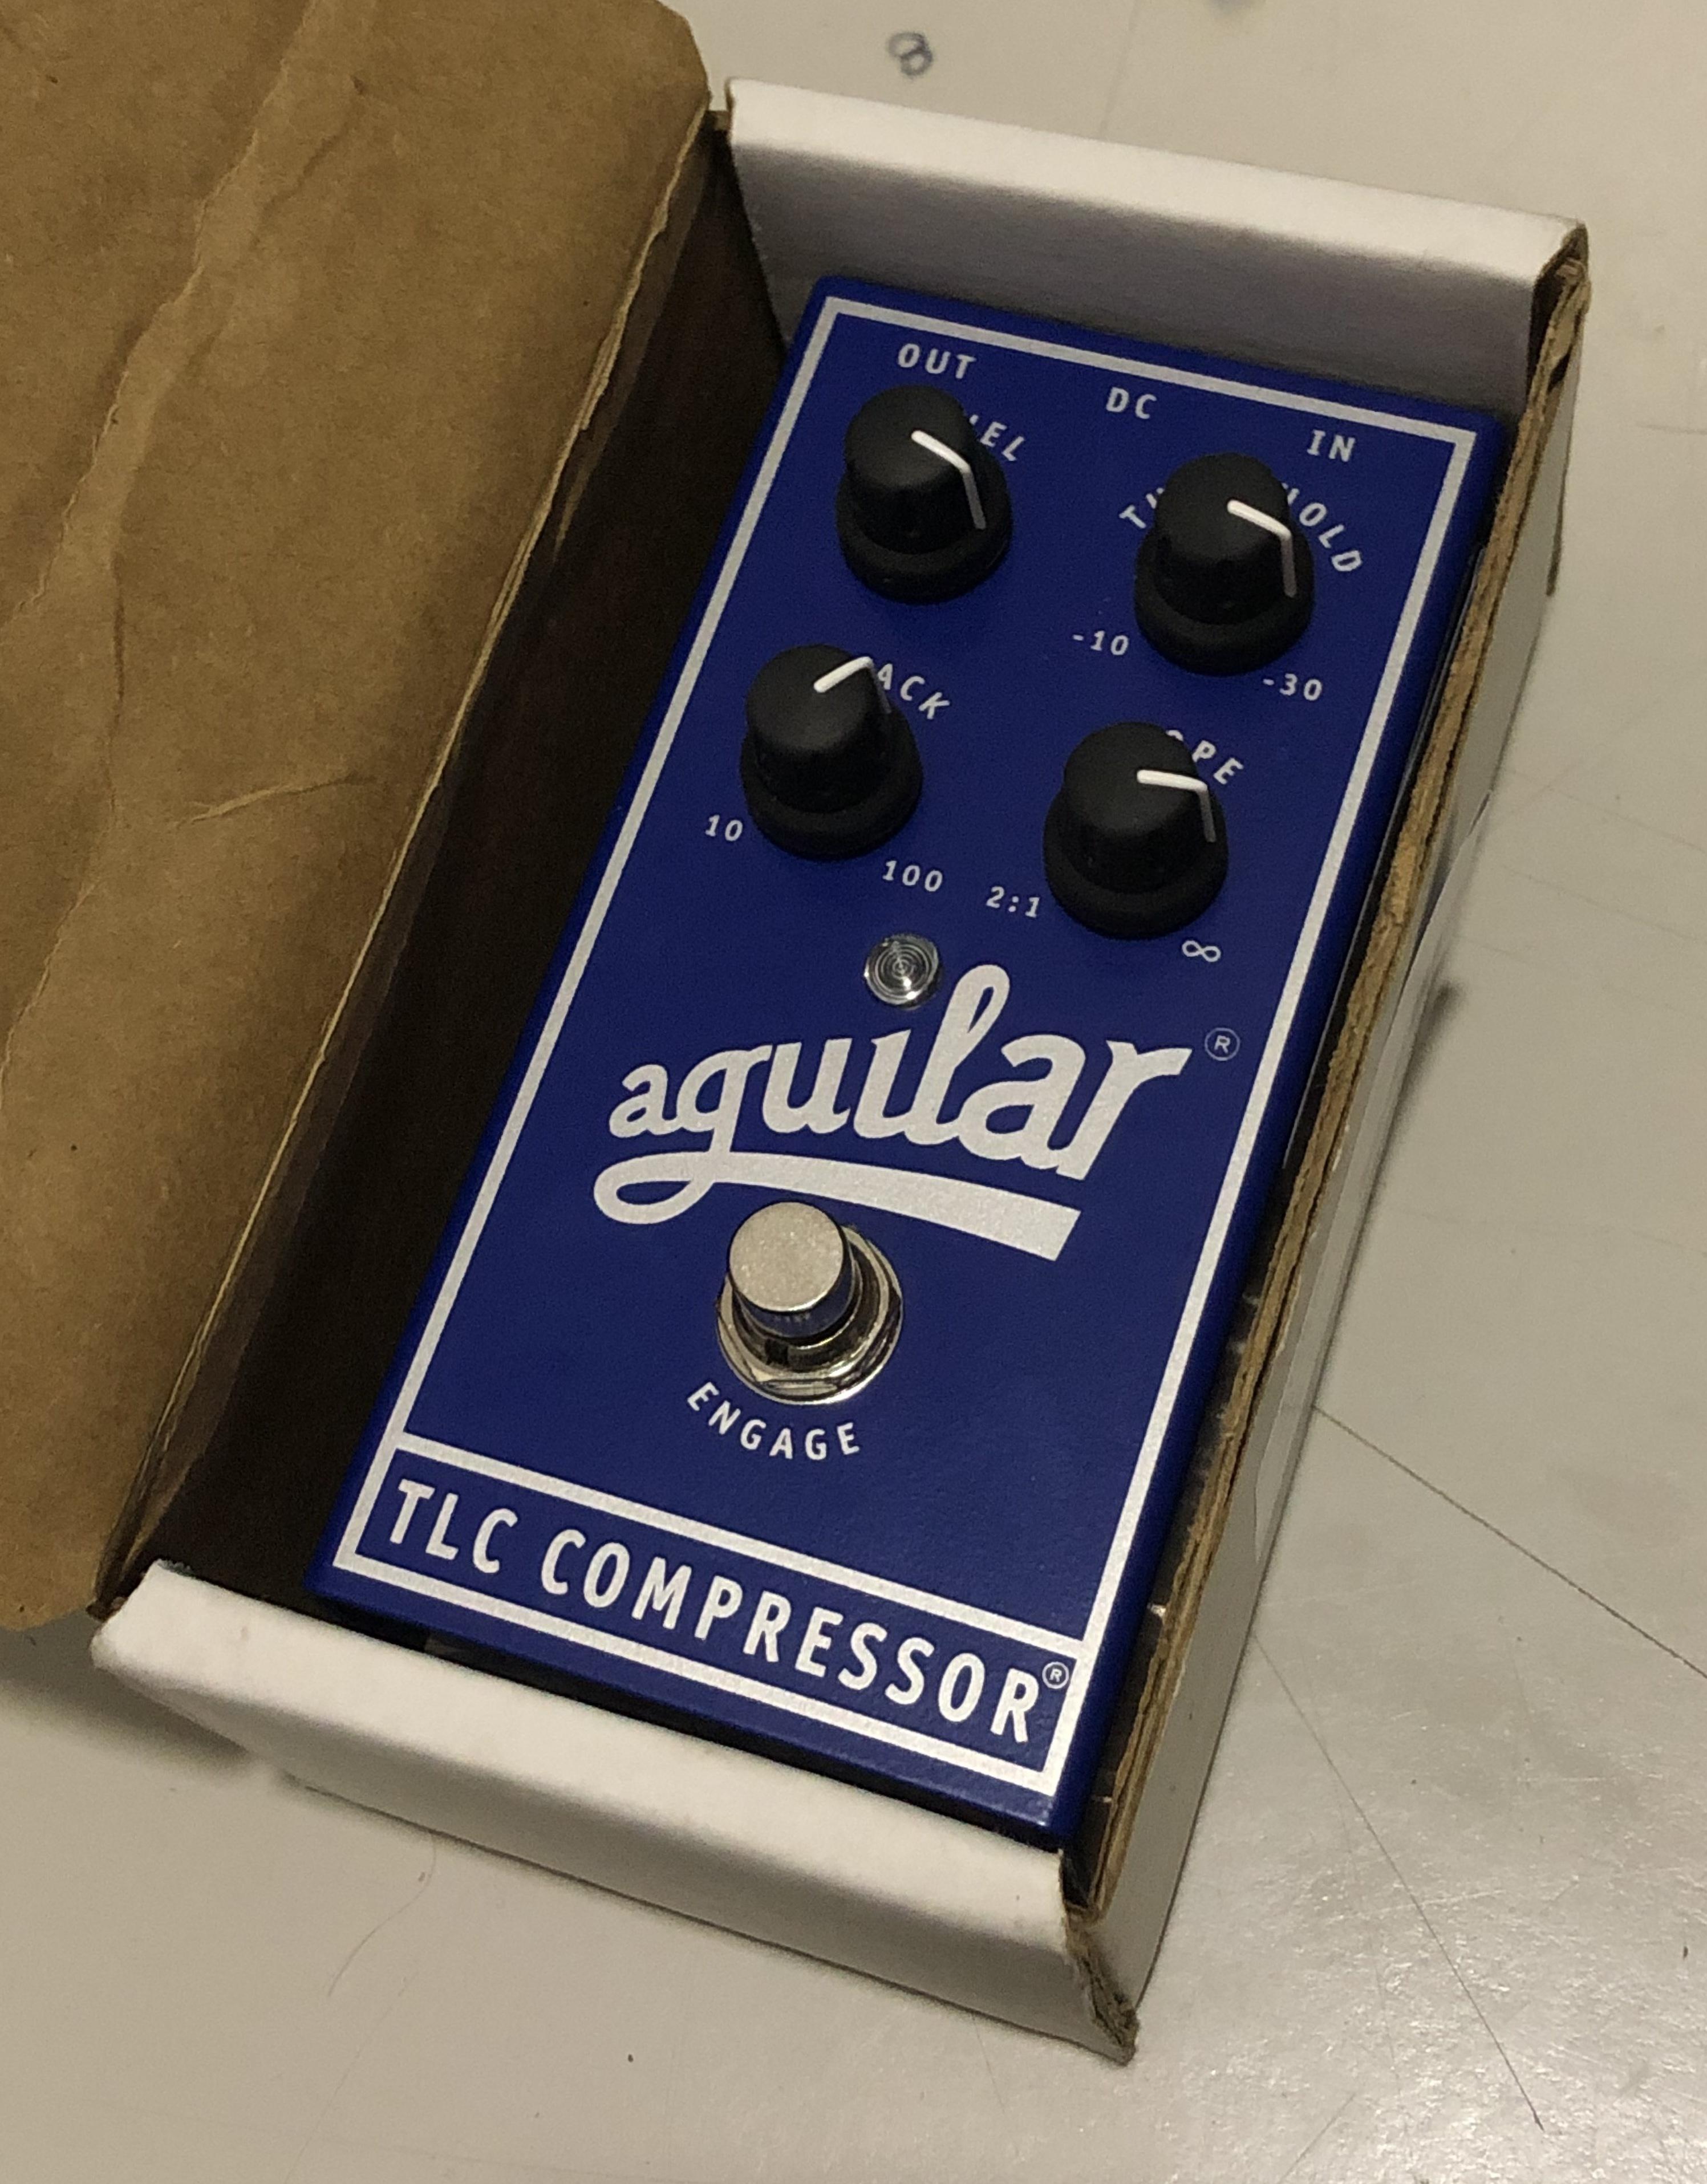 AGUILAR - TLC Compression Pedal